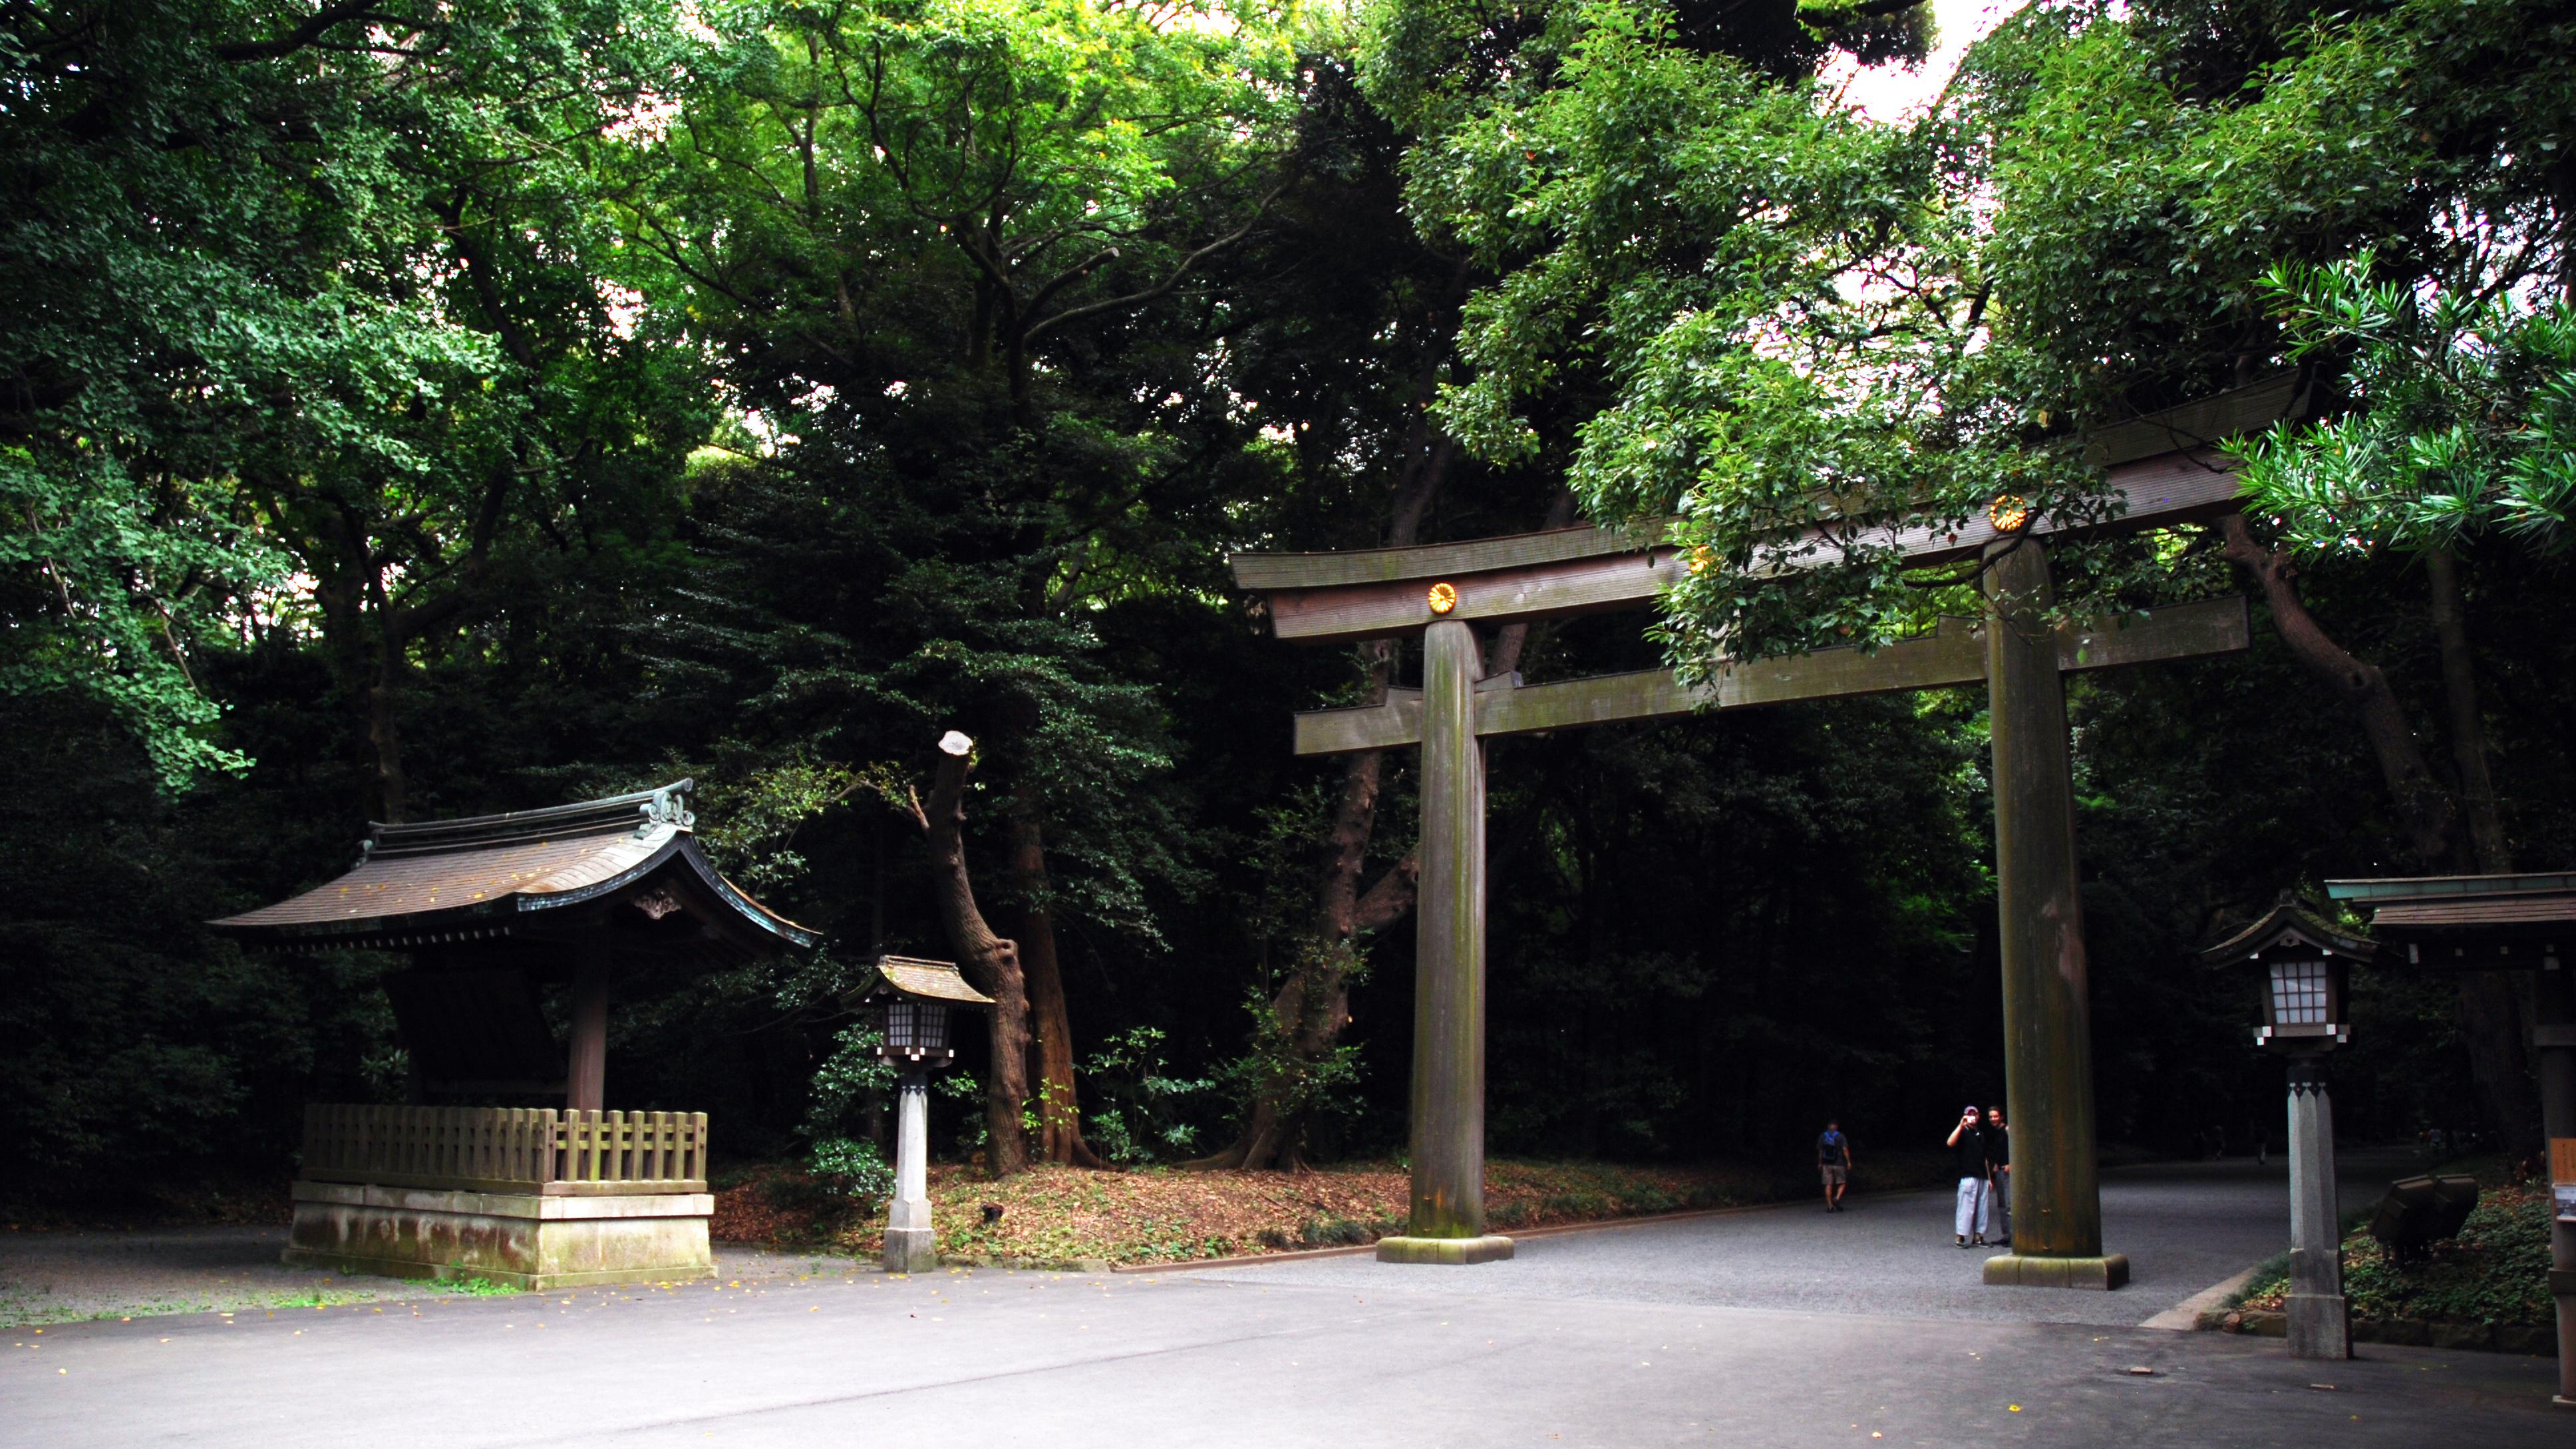 File:Meiji shrine entrance tori.jpg